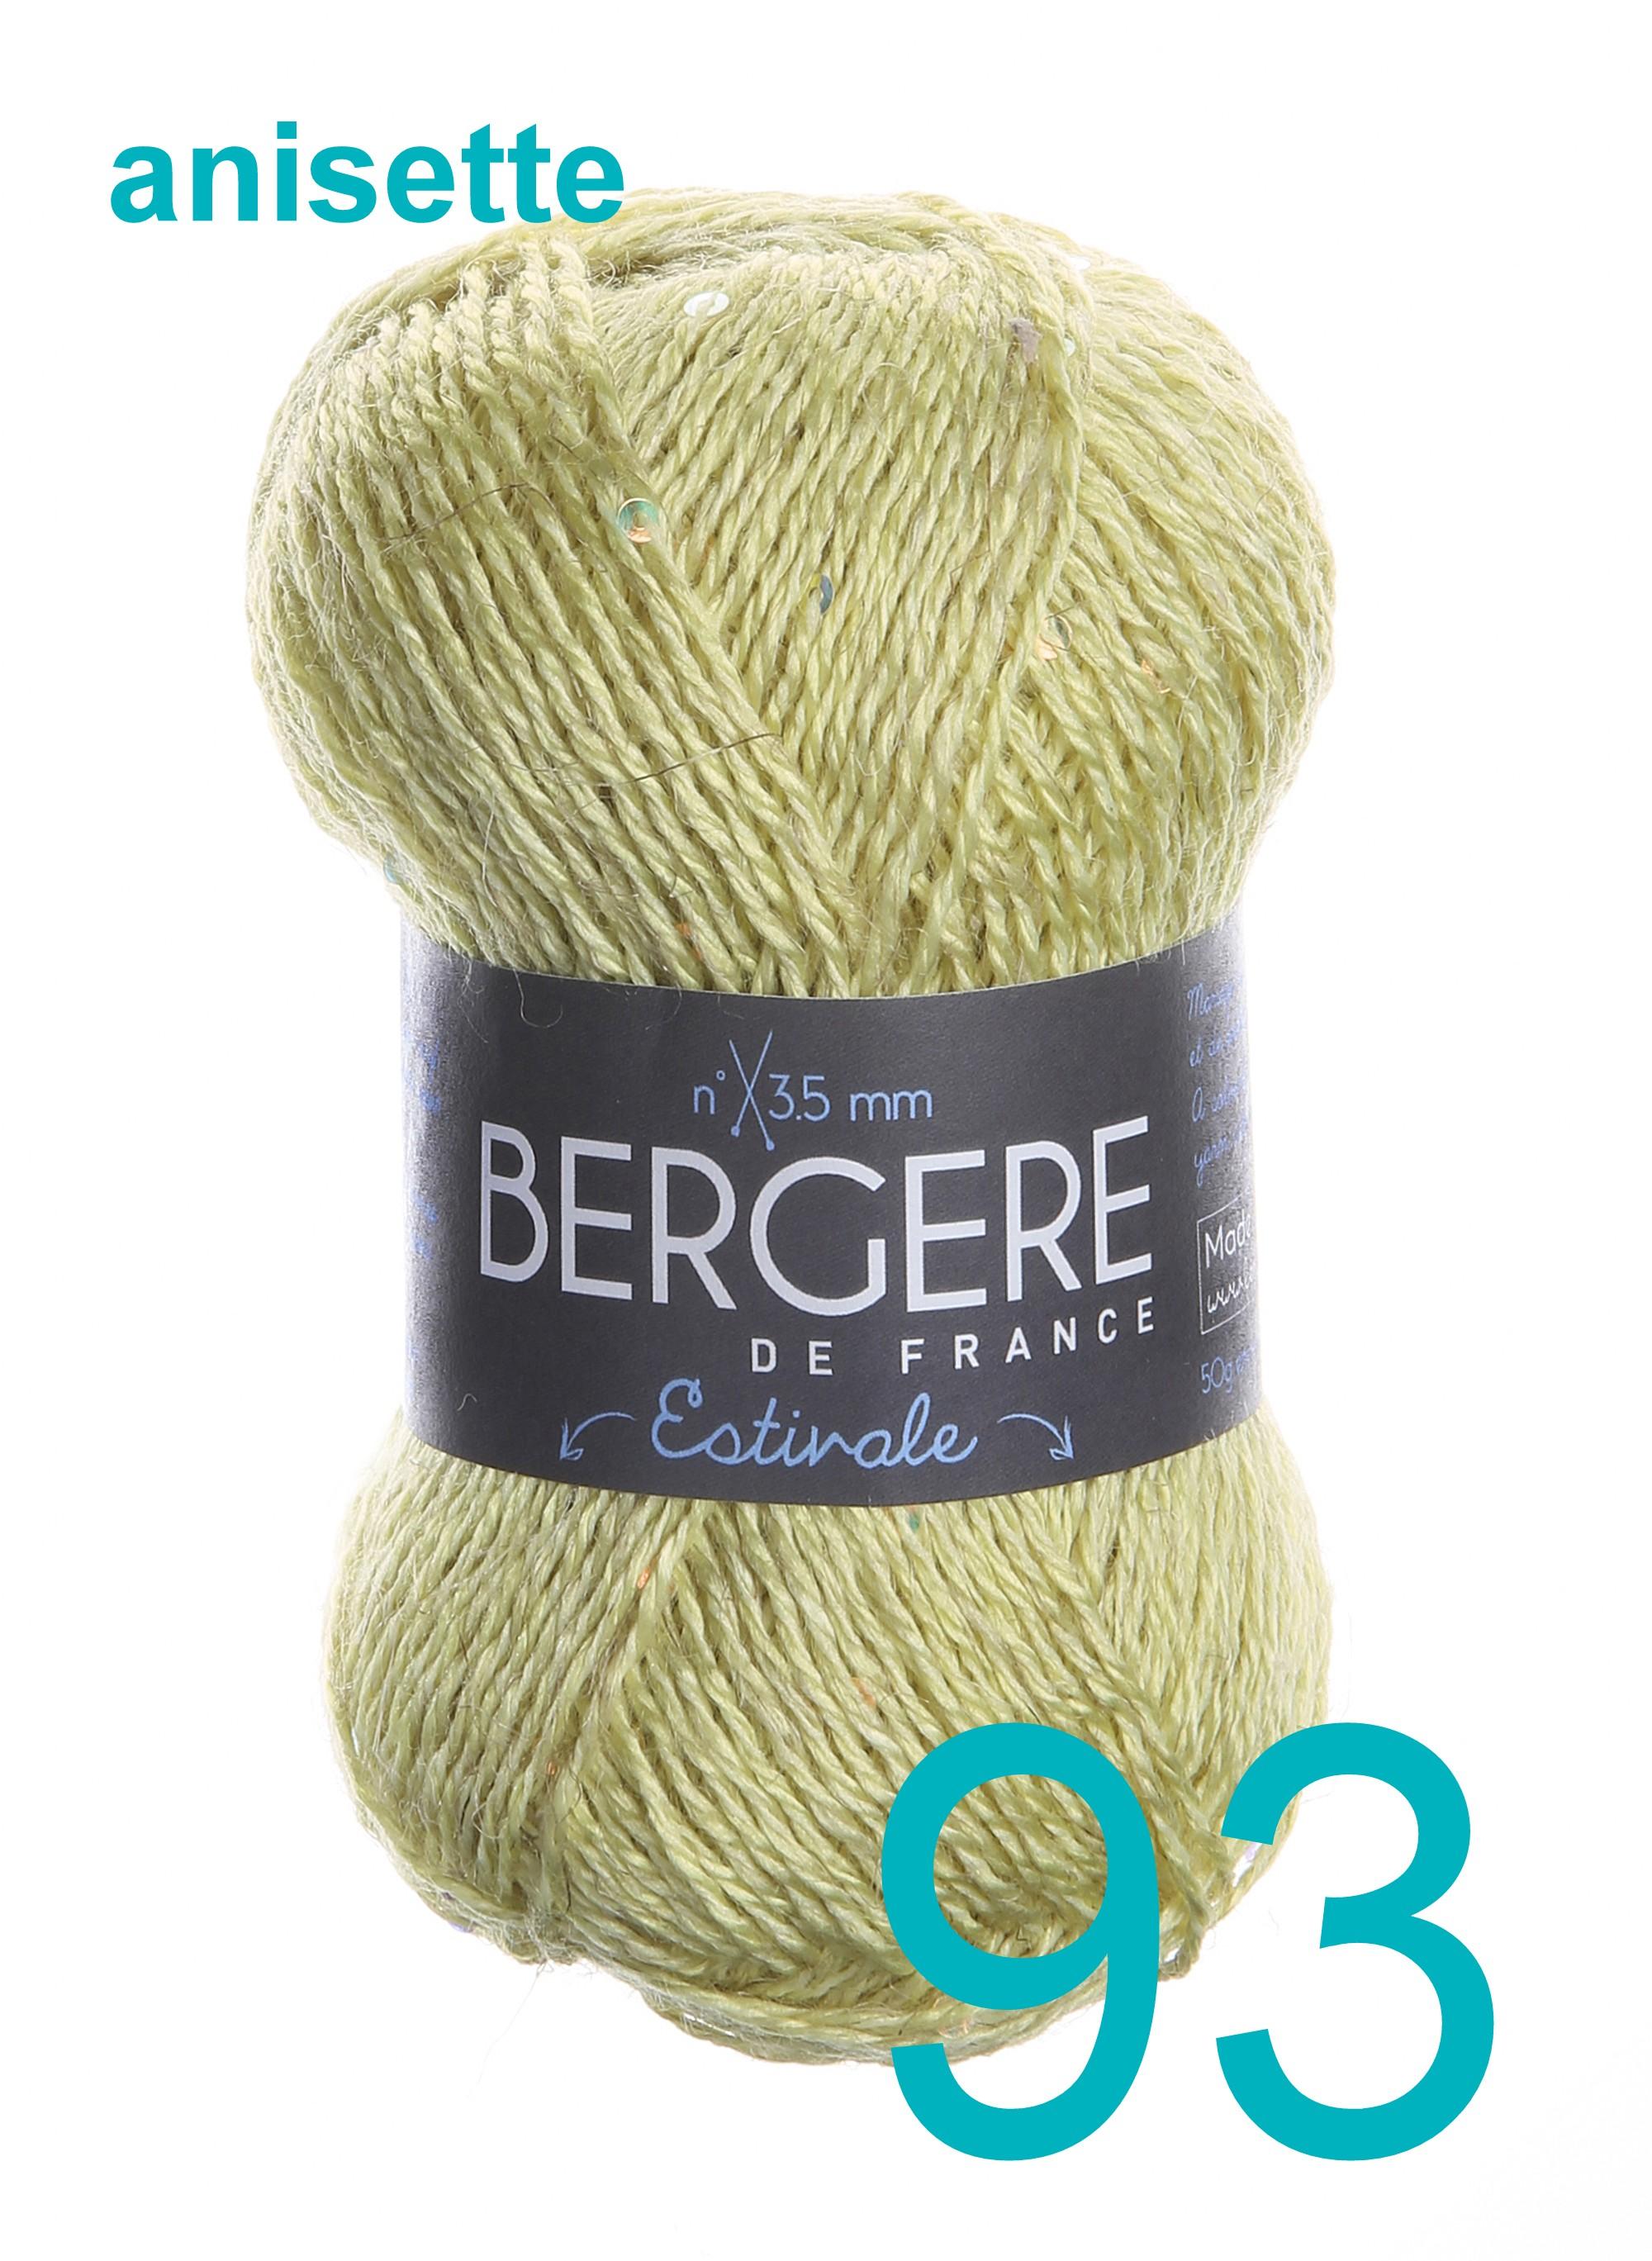 Bergere Ecoton anisette 93